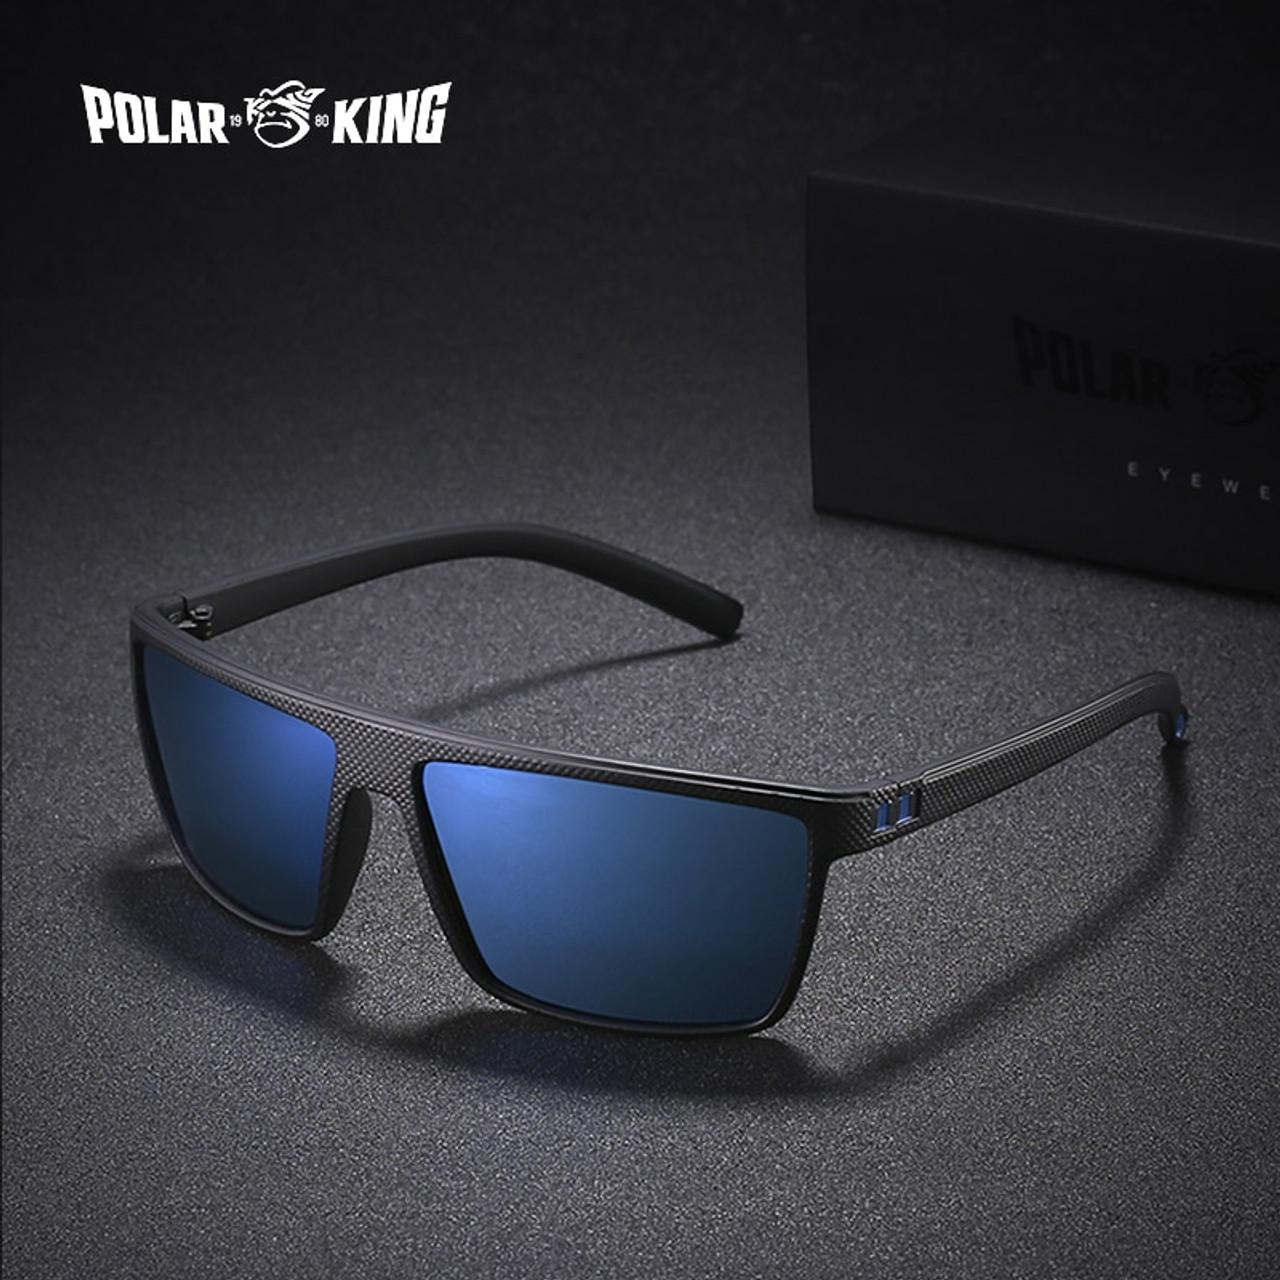 8c3cd35fbfc02 POLARKING Brand Retro Polarized Sunglasses For Men Oculos de sol Men s  Fashion Square Driving Eyewear Traveling ...